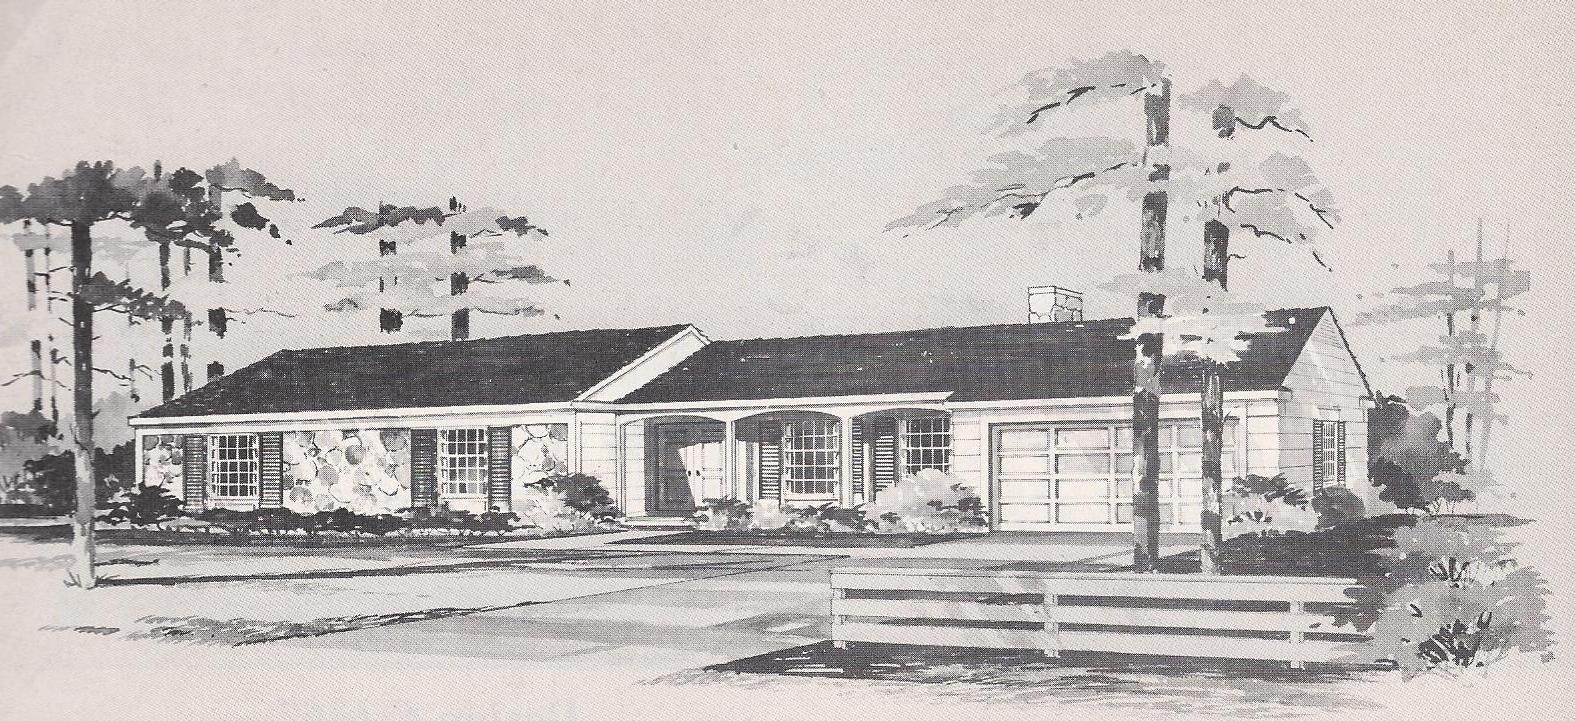 Vintage House Plans 1316 Antique Alter Ego